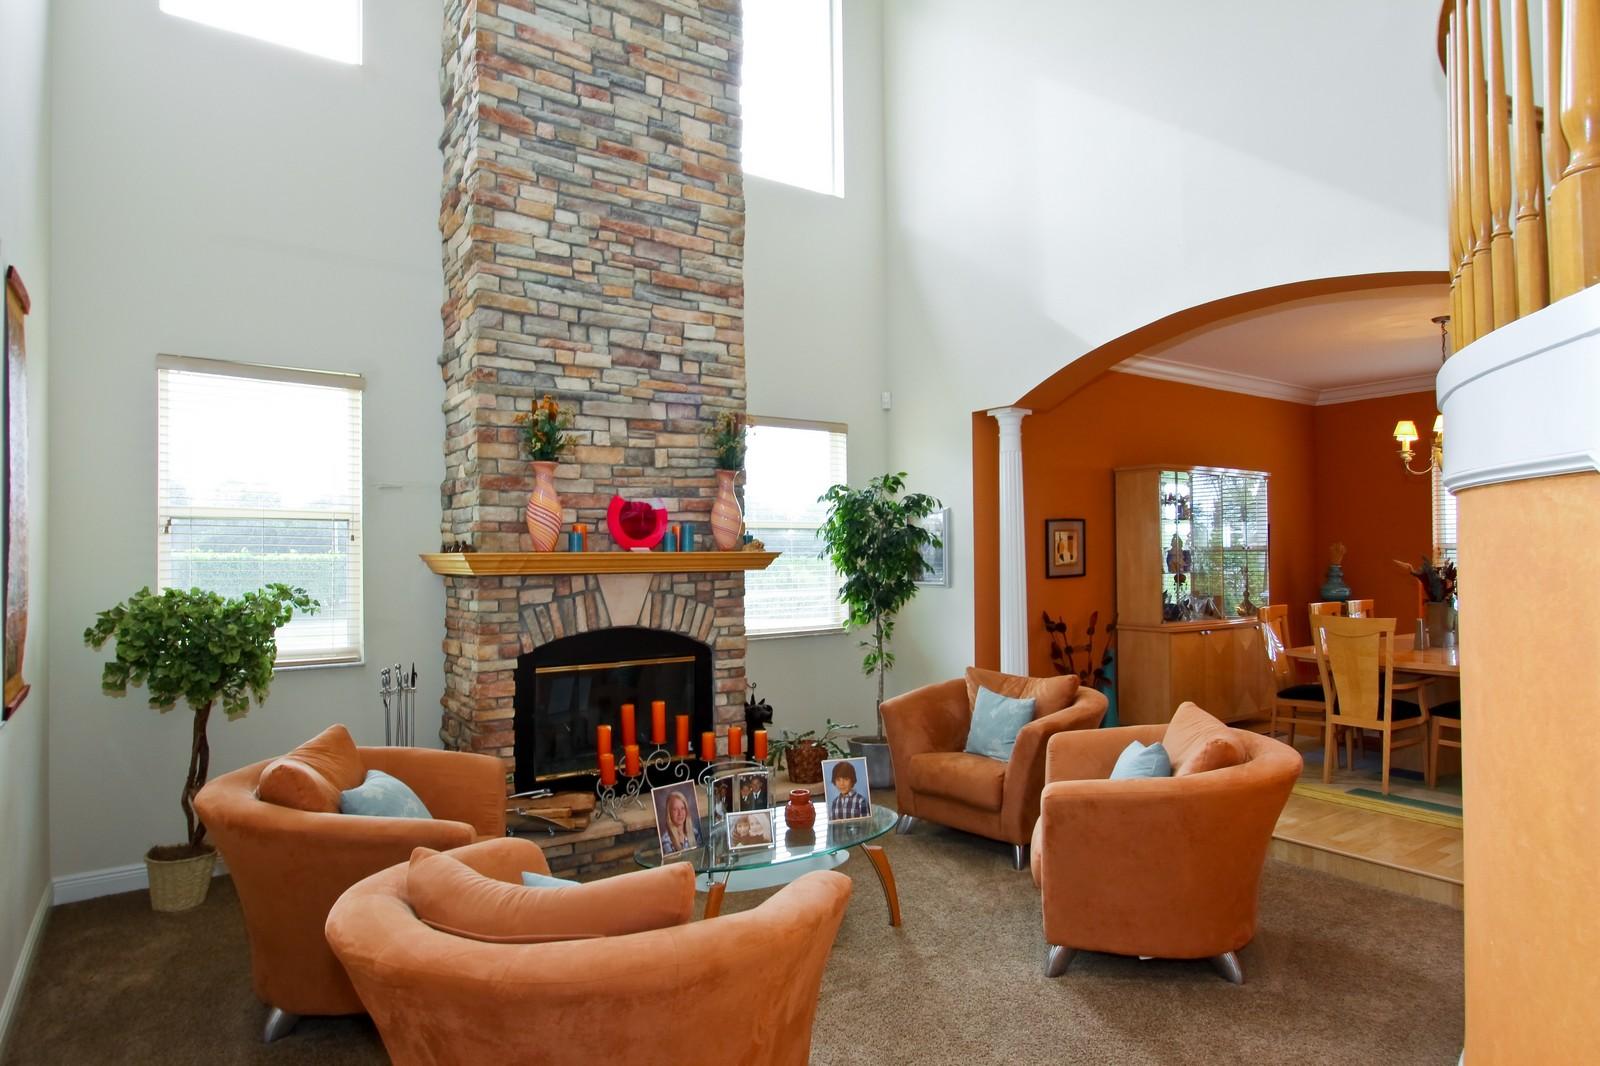 Real Estate Photography - 14542 Draft Horse Ln, Wellington, FL, 33414 - Living Room / Dining Room